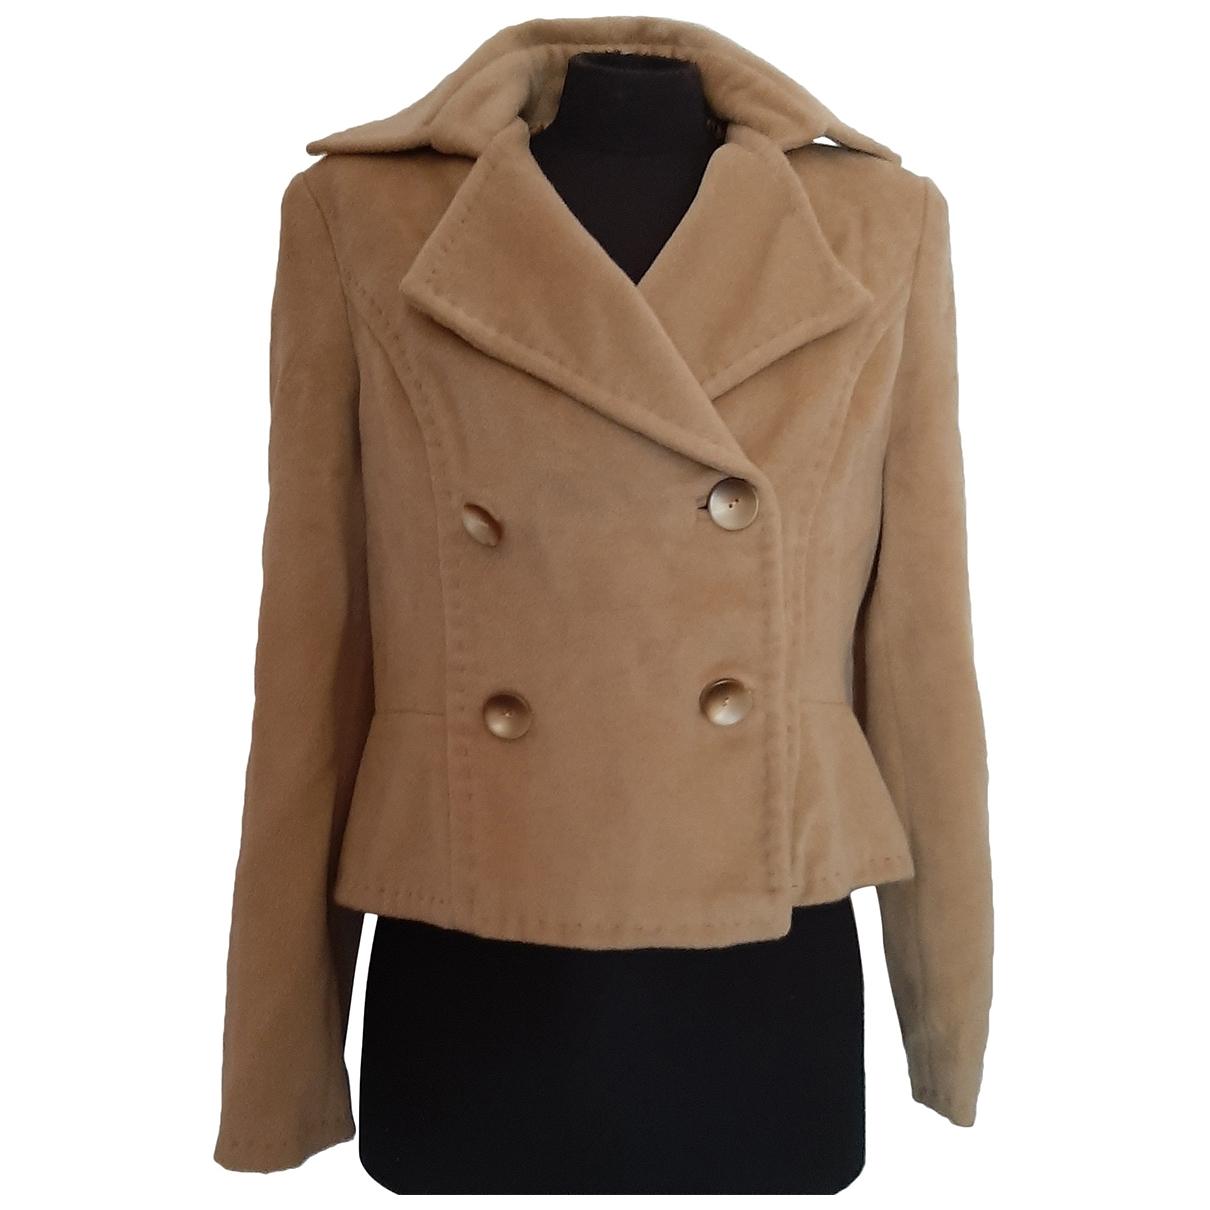 Max Mara \N Camel Wool jacket for Women S International